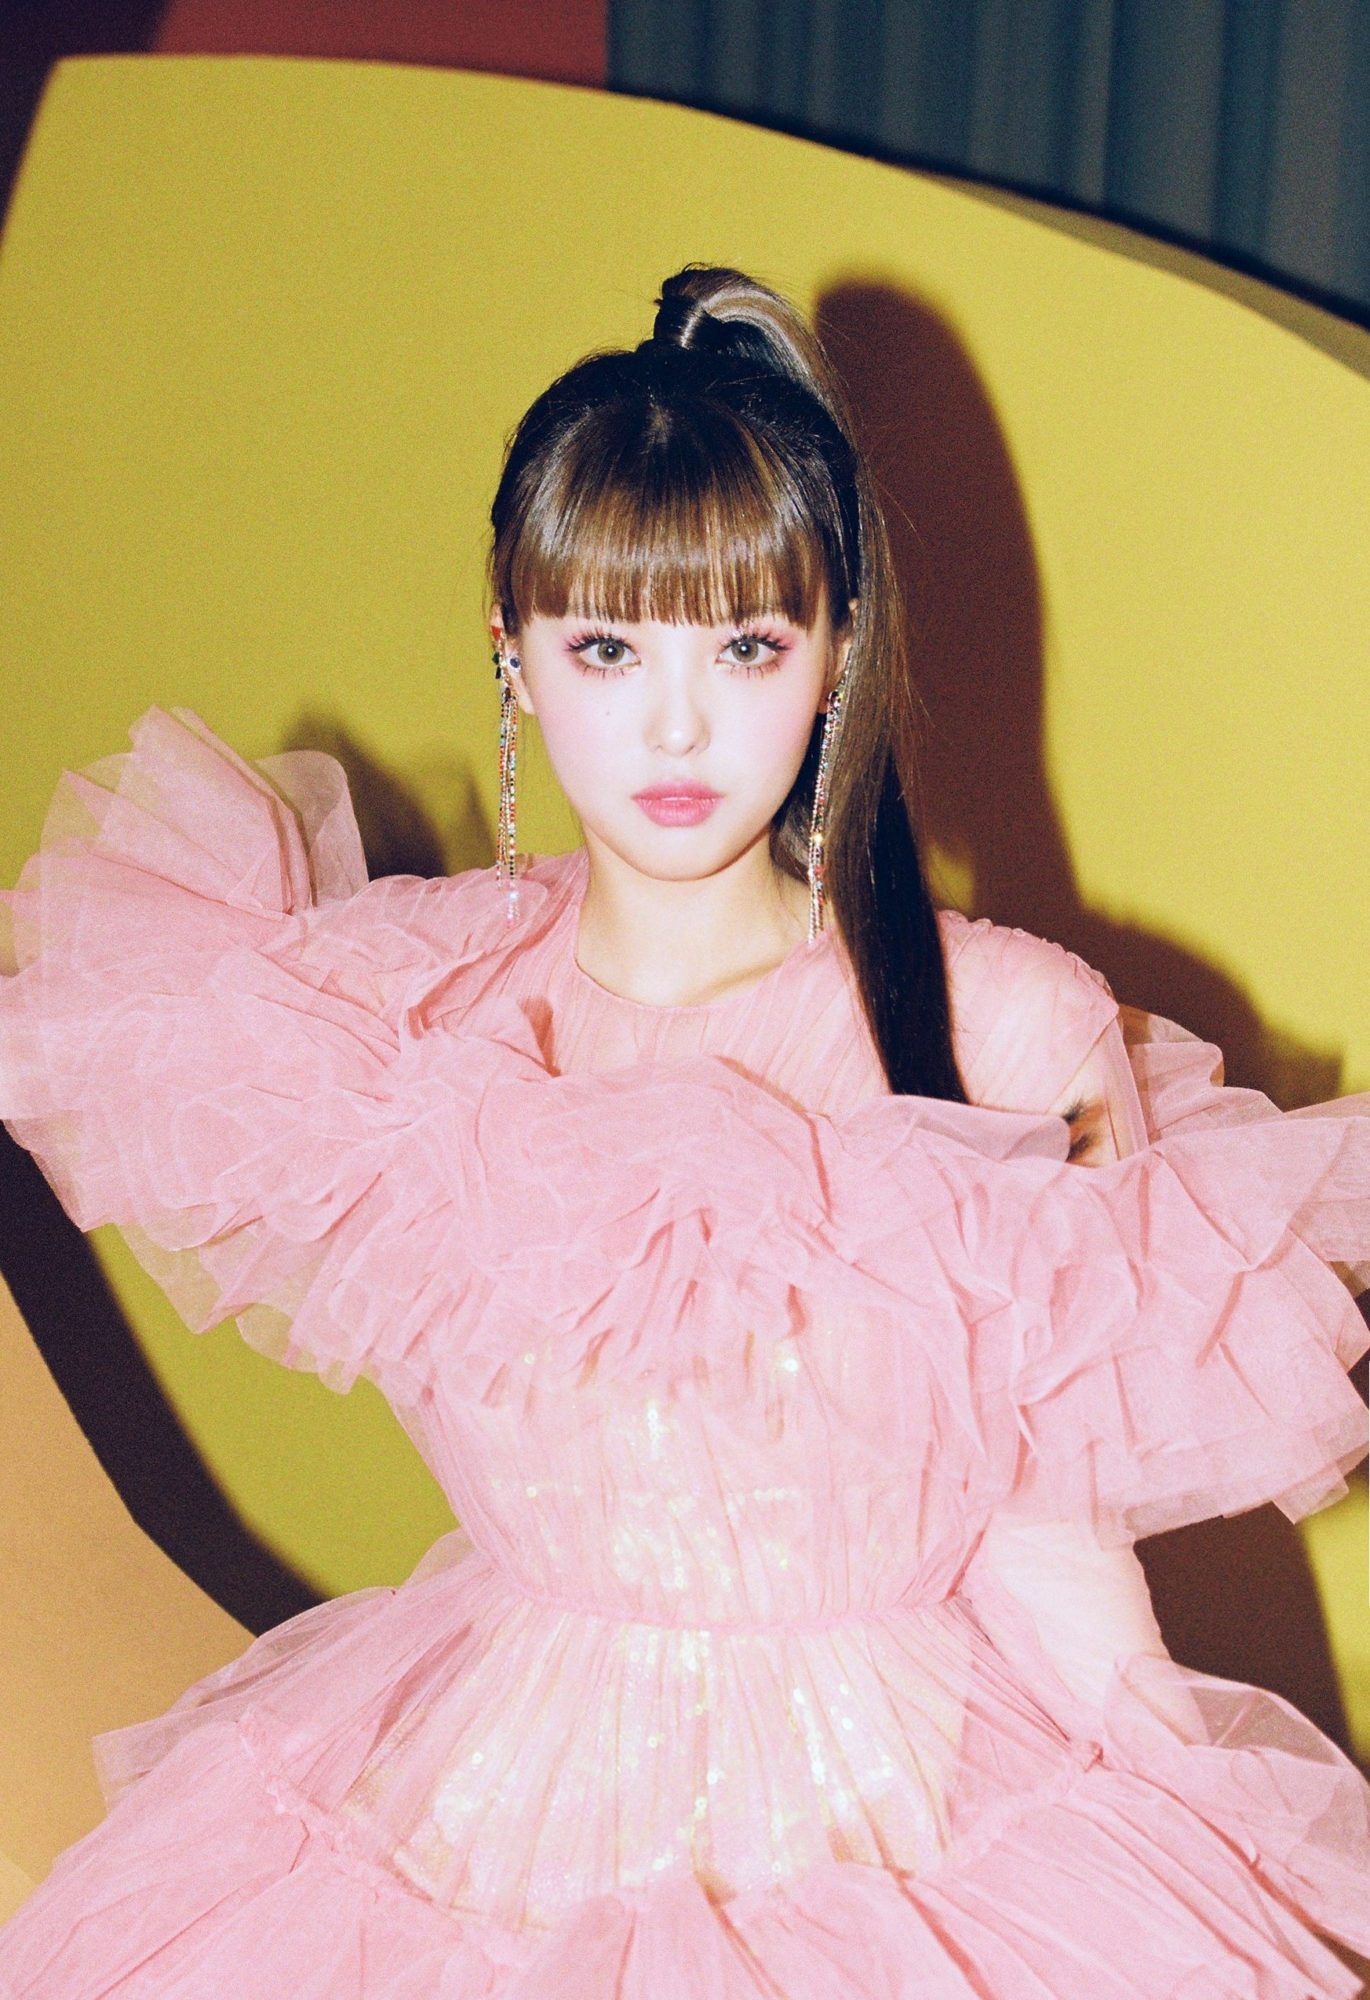 Momoland Thumbs Up Concept Photos Hd Hr Kpop Girl Groups Kpop Girls Korean Girl Groups